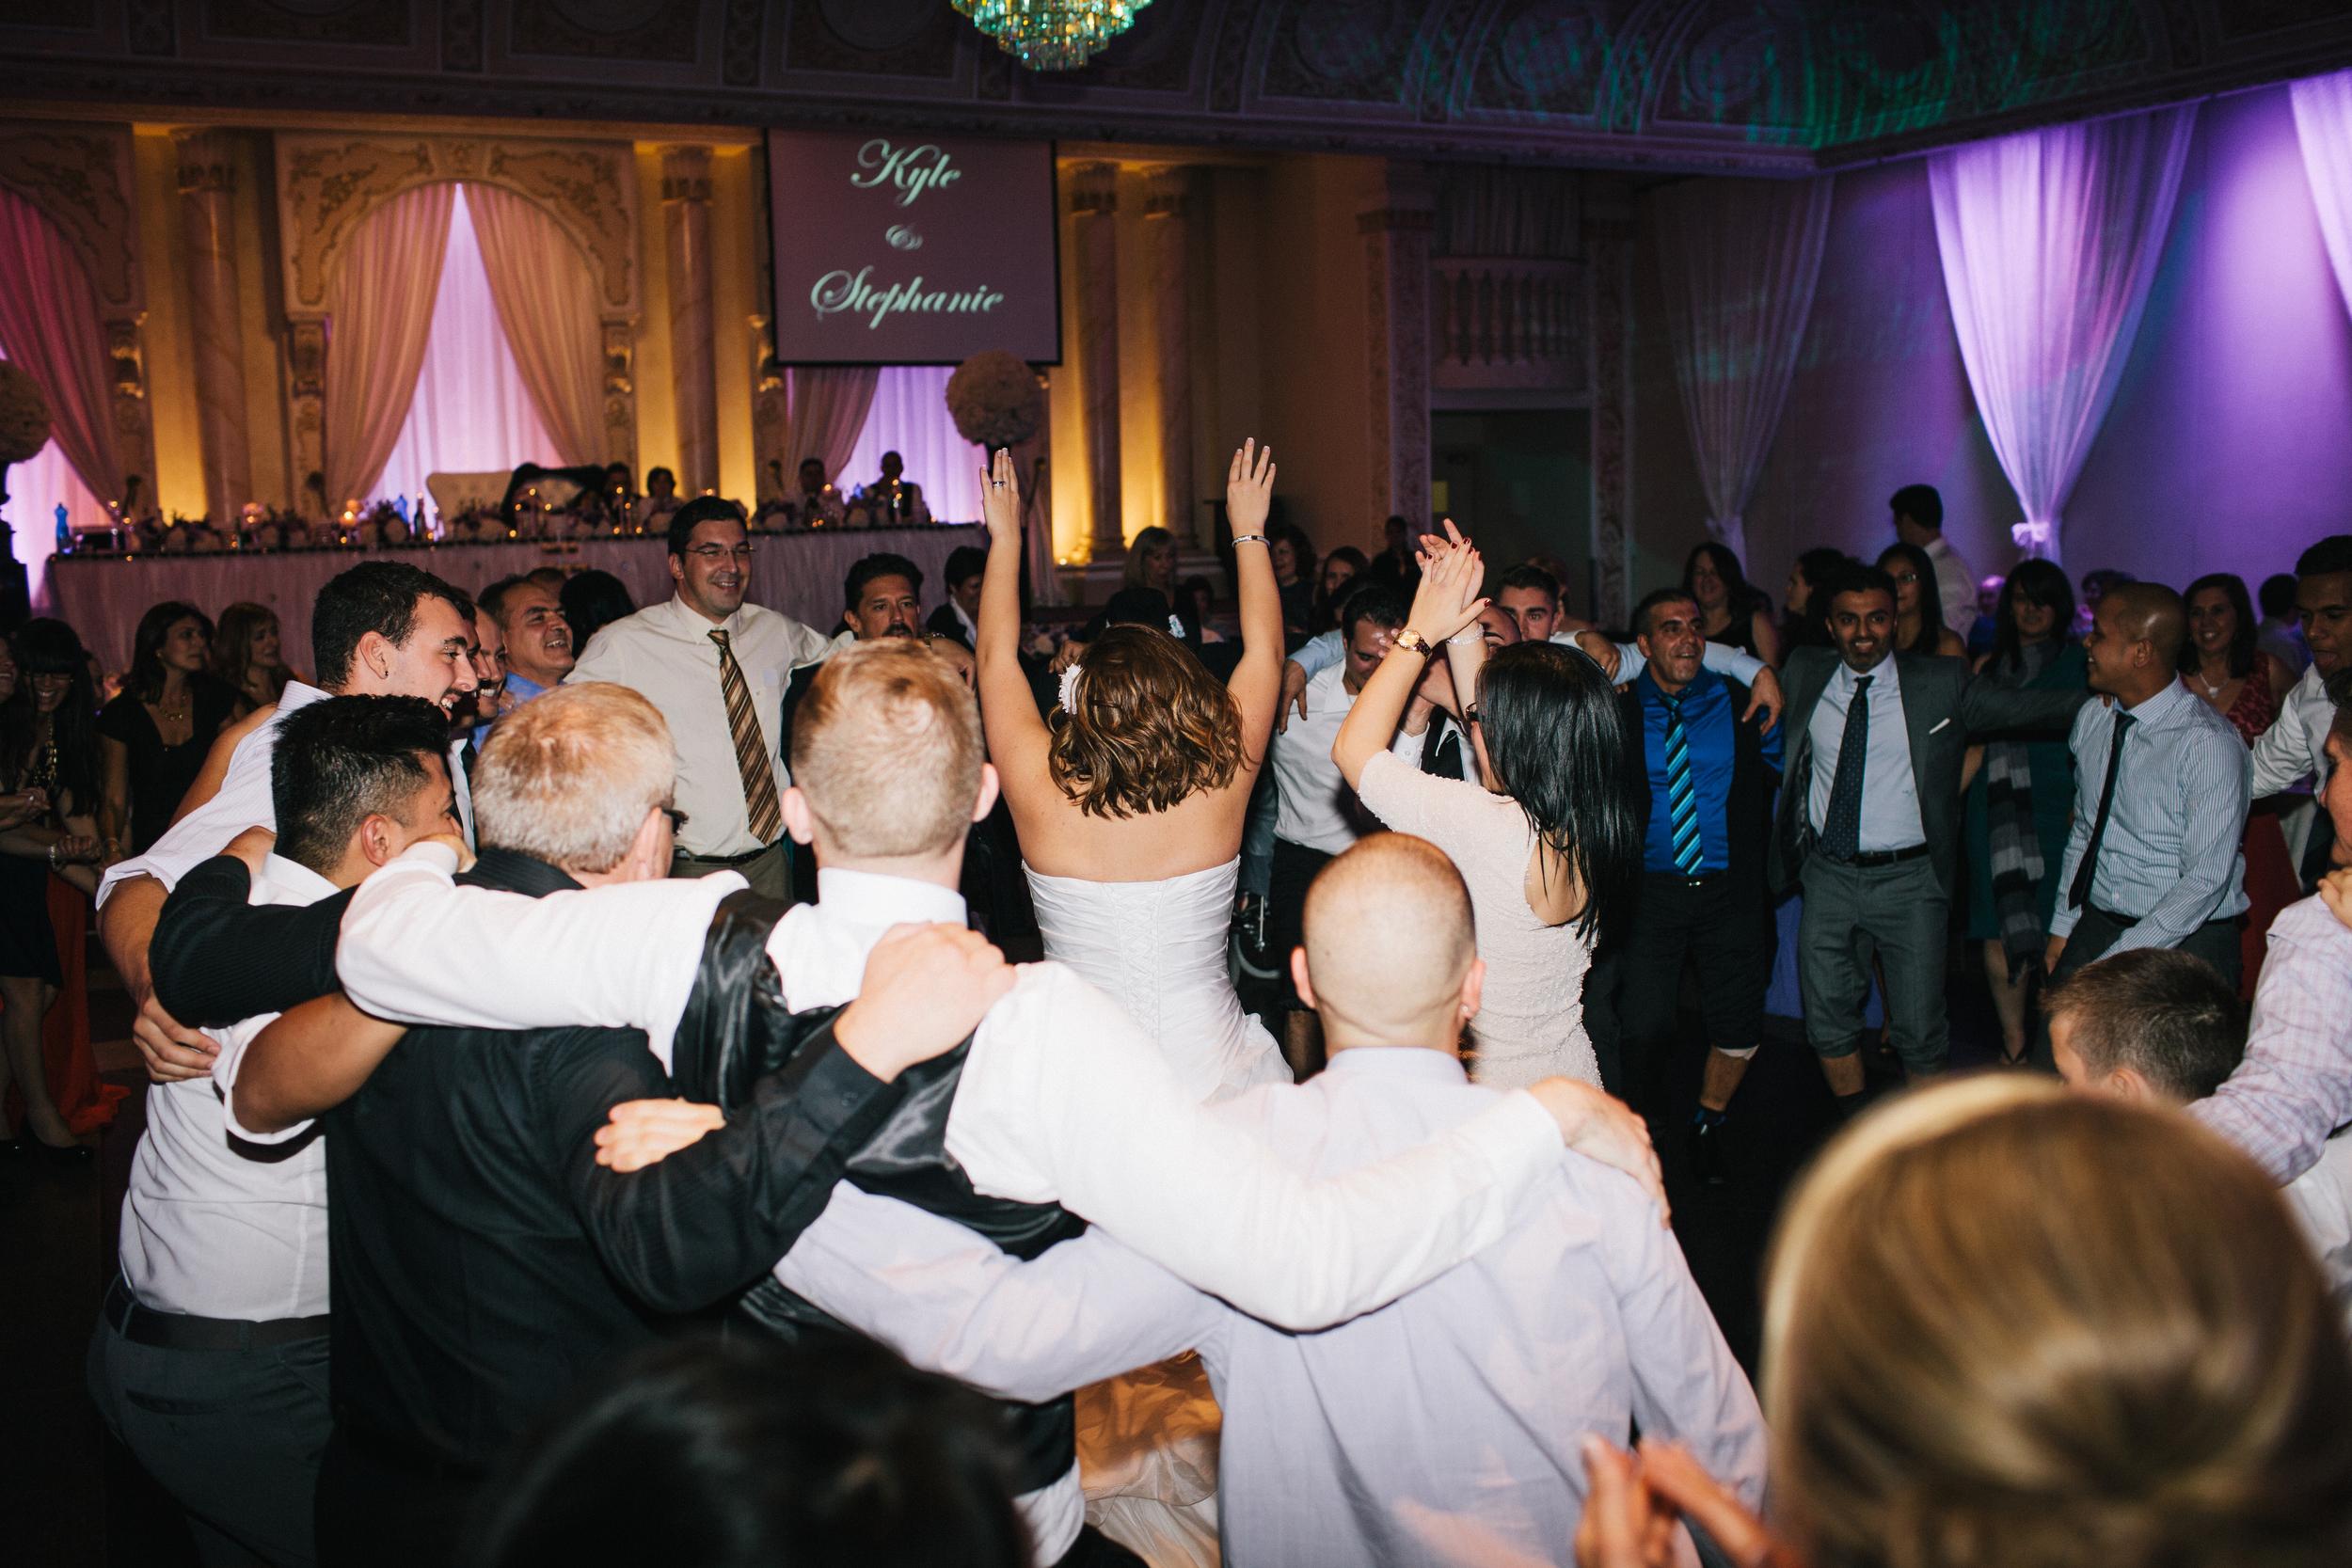 Stephanie-Kyle-paradise-banquet-hall-michael-rousseau-photography-best-toronto-wedding-photographer-documentary-wedding059.JPG